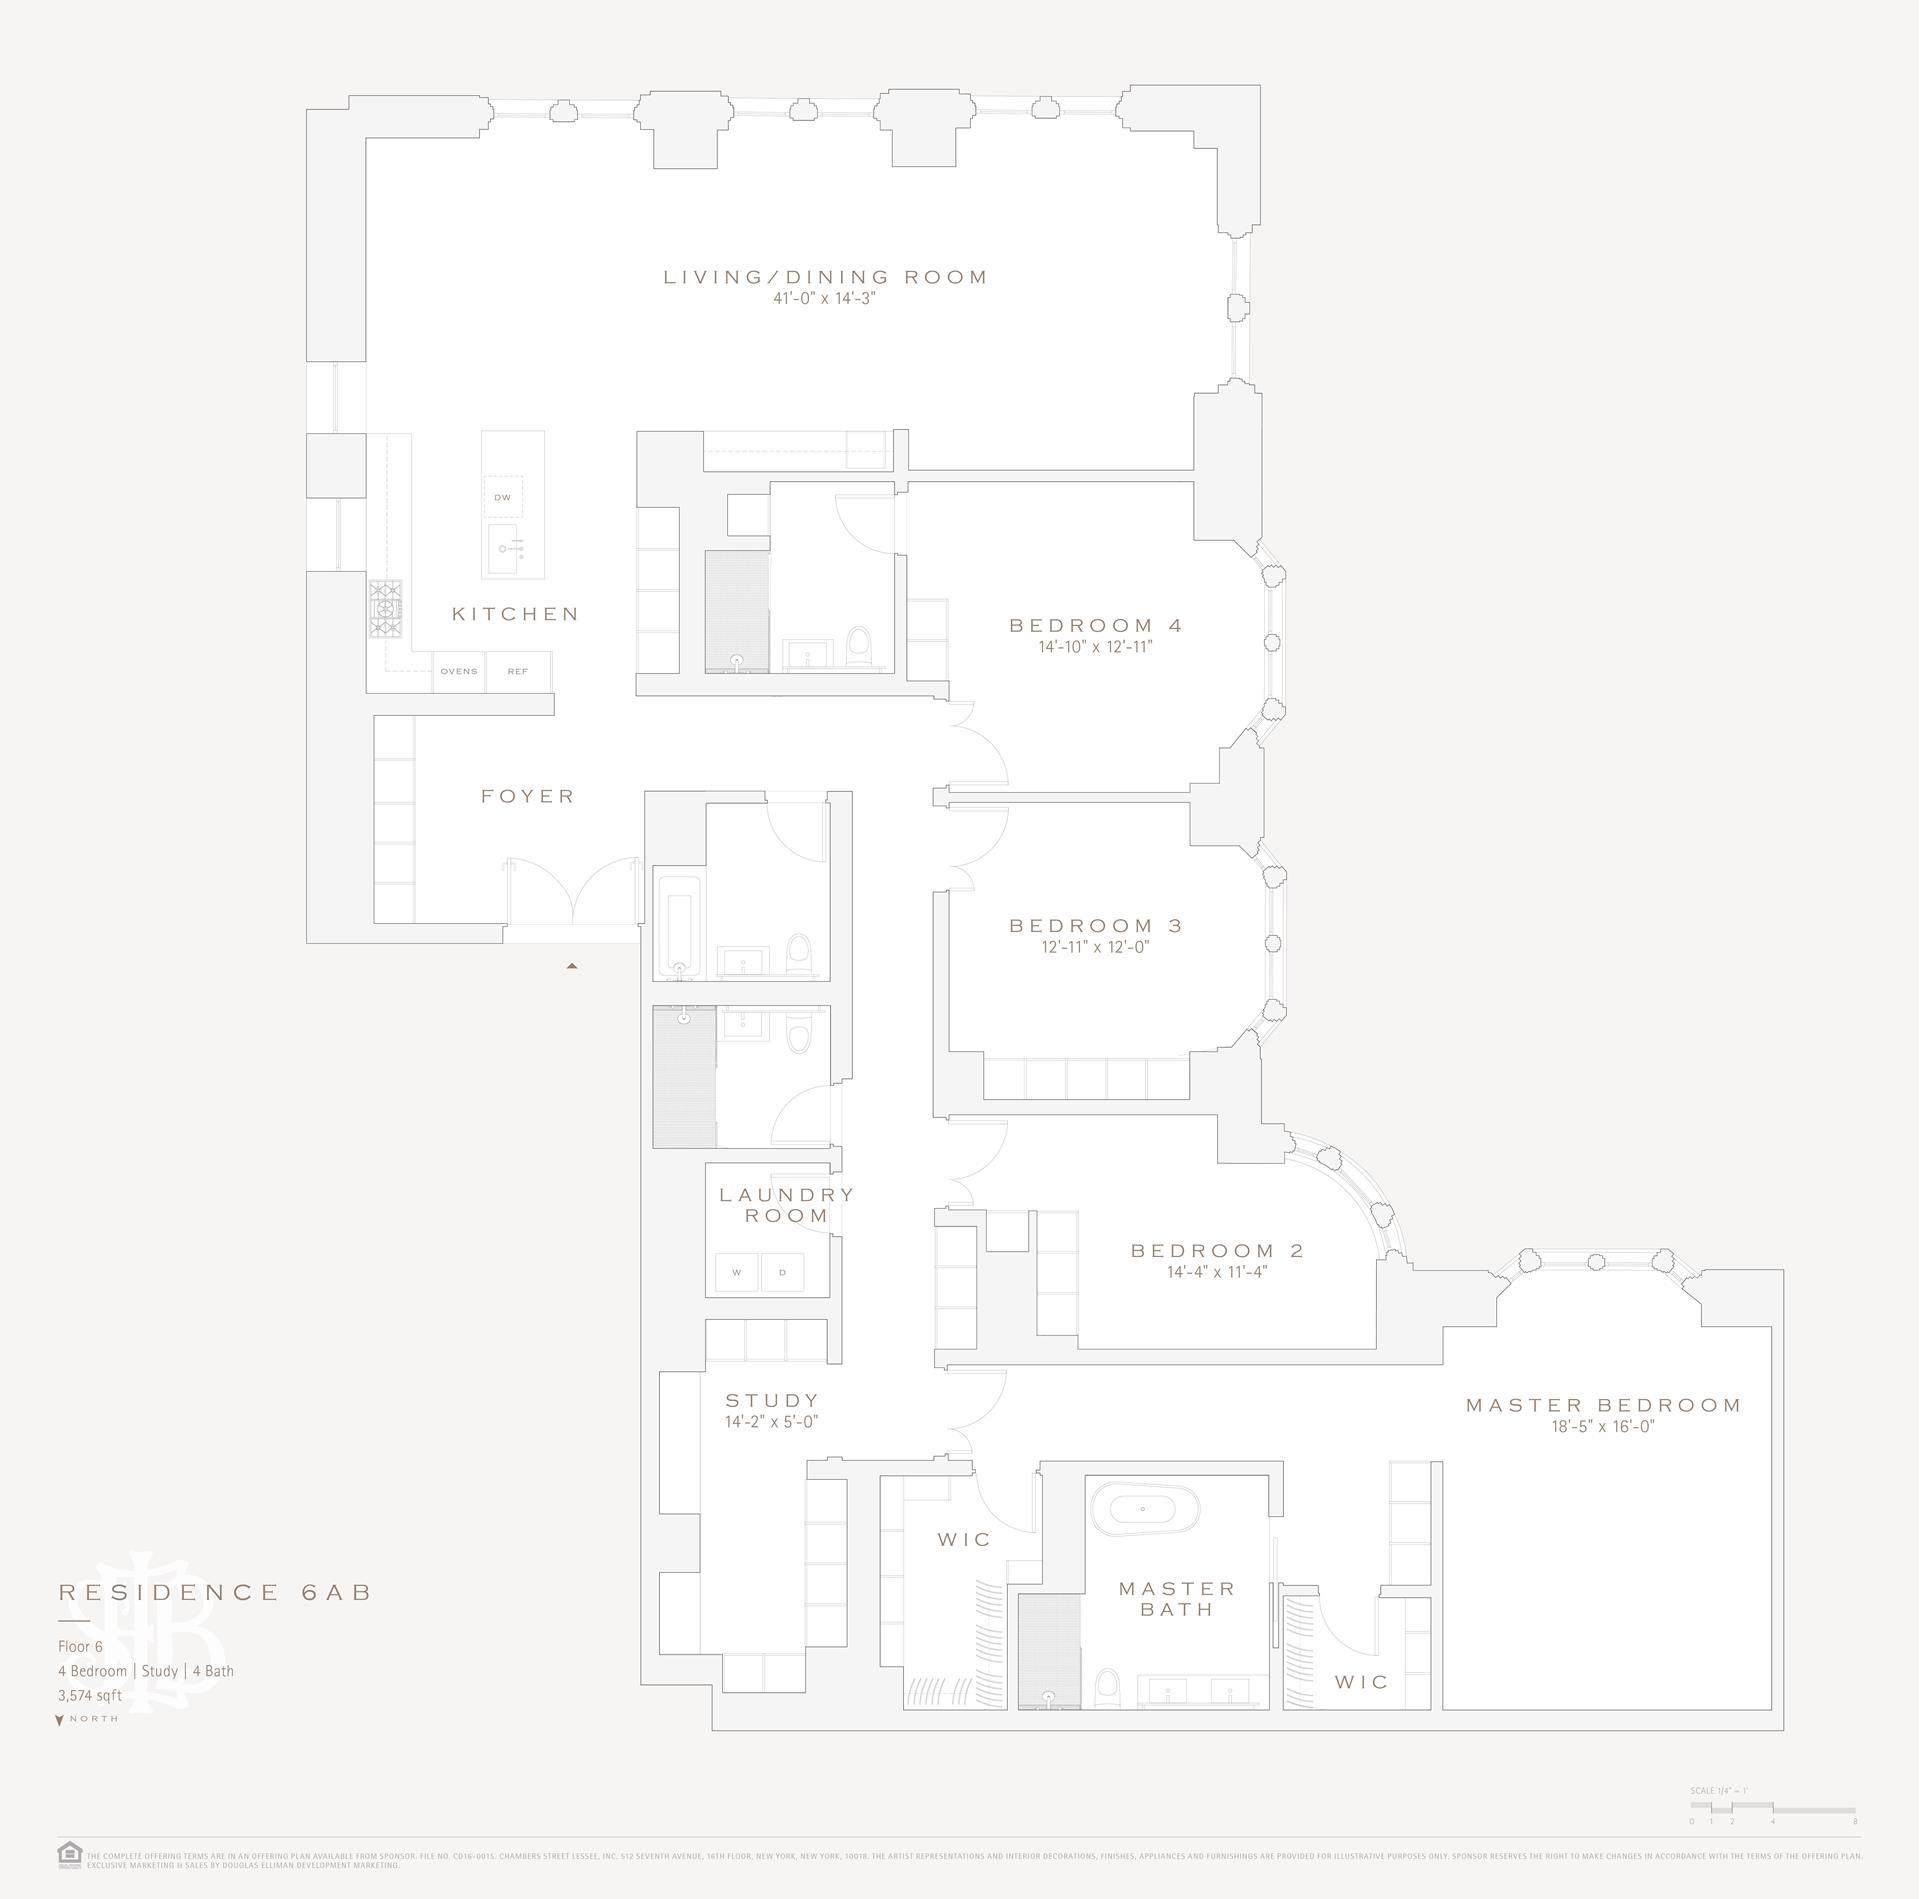 Floor plan of 49 Chambers St, 6AB - TriBeCa, New York